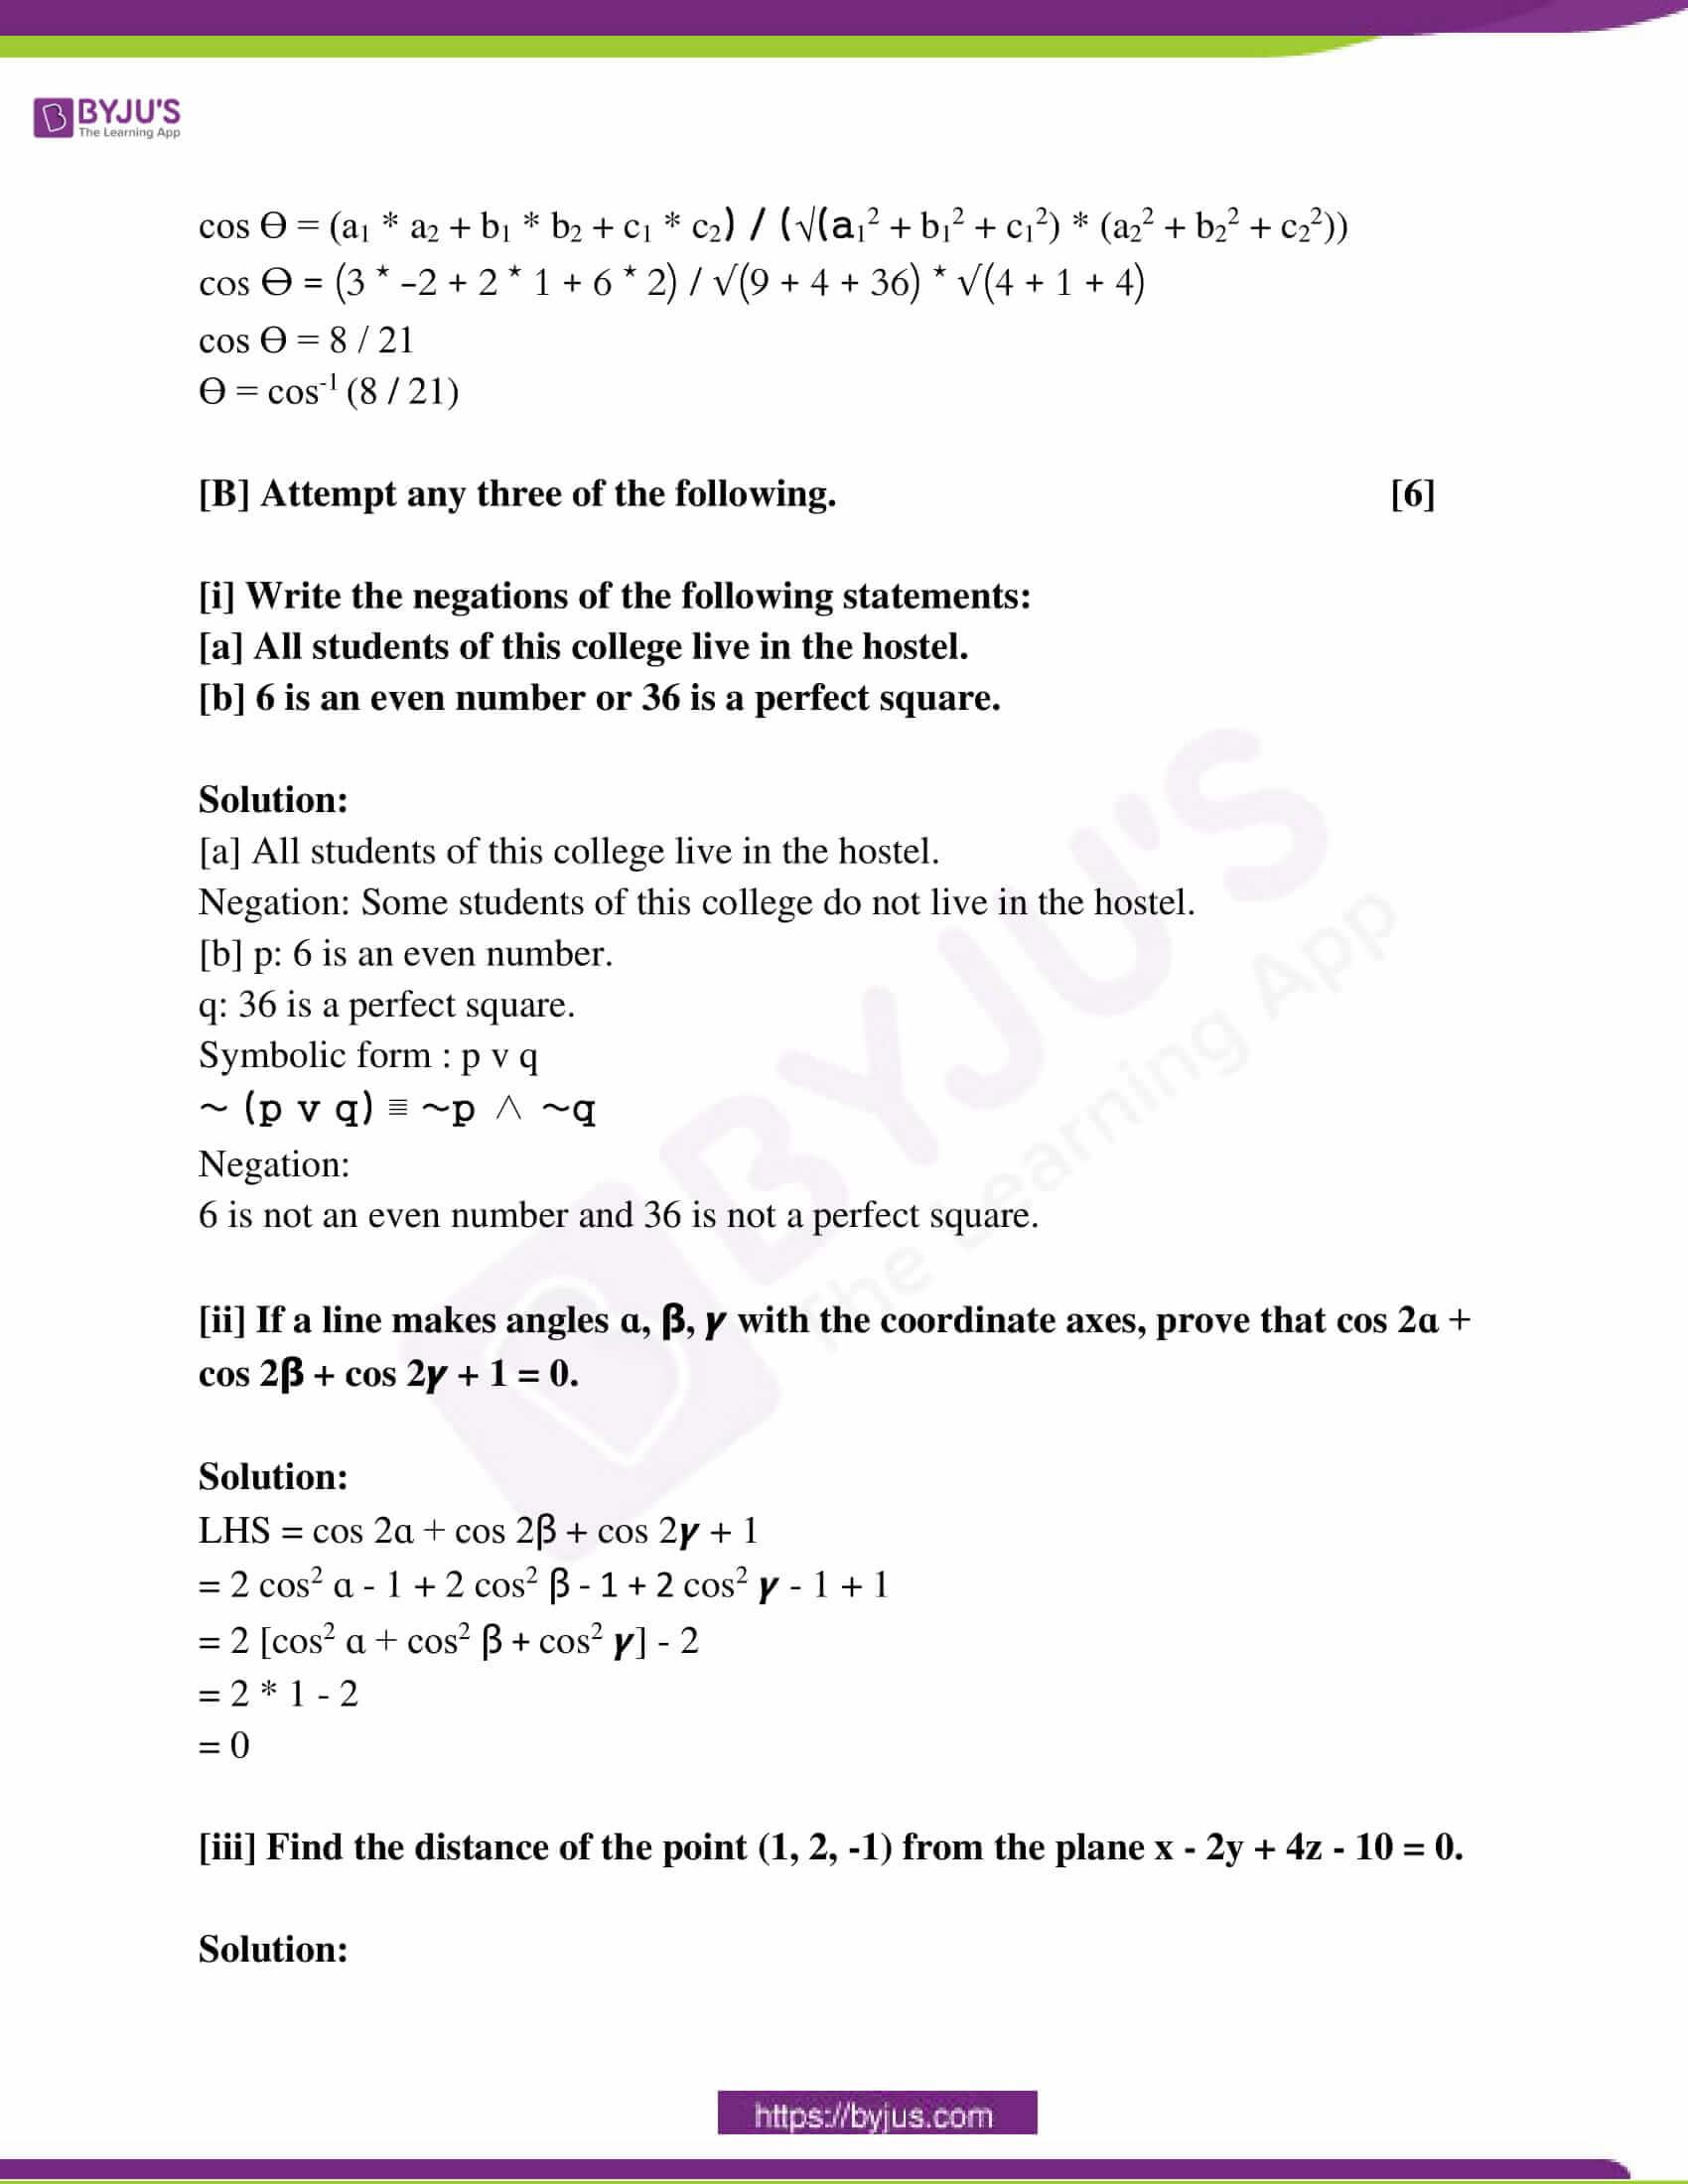 maharashtra class 12 exam question paper solutions march 2018 03